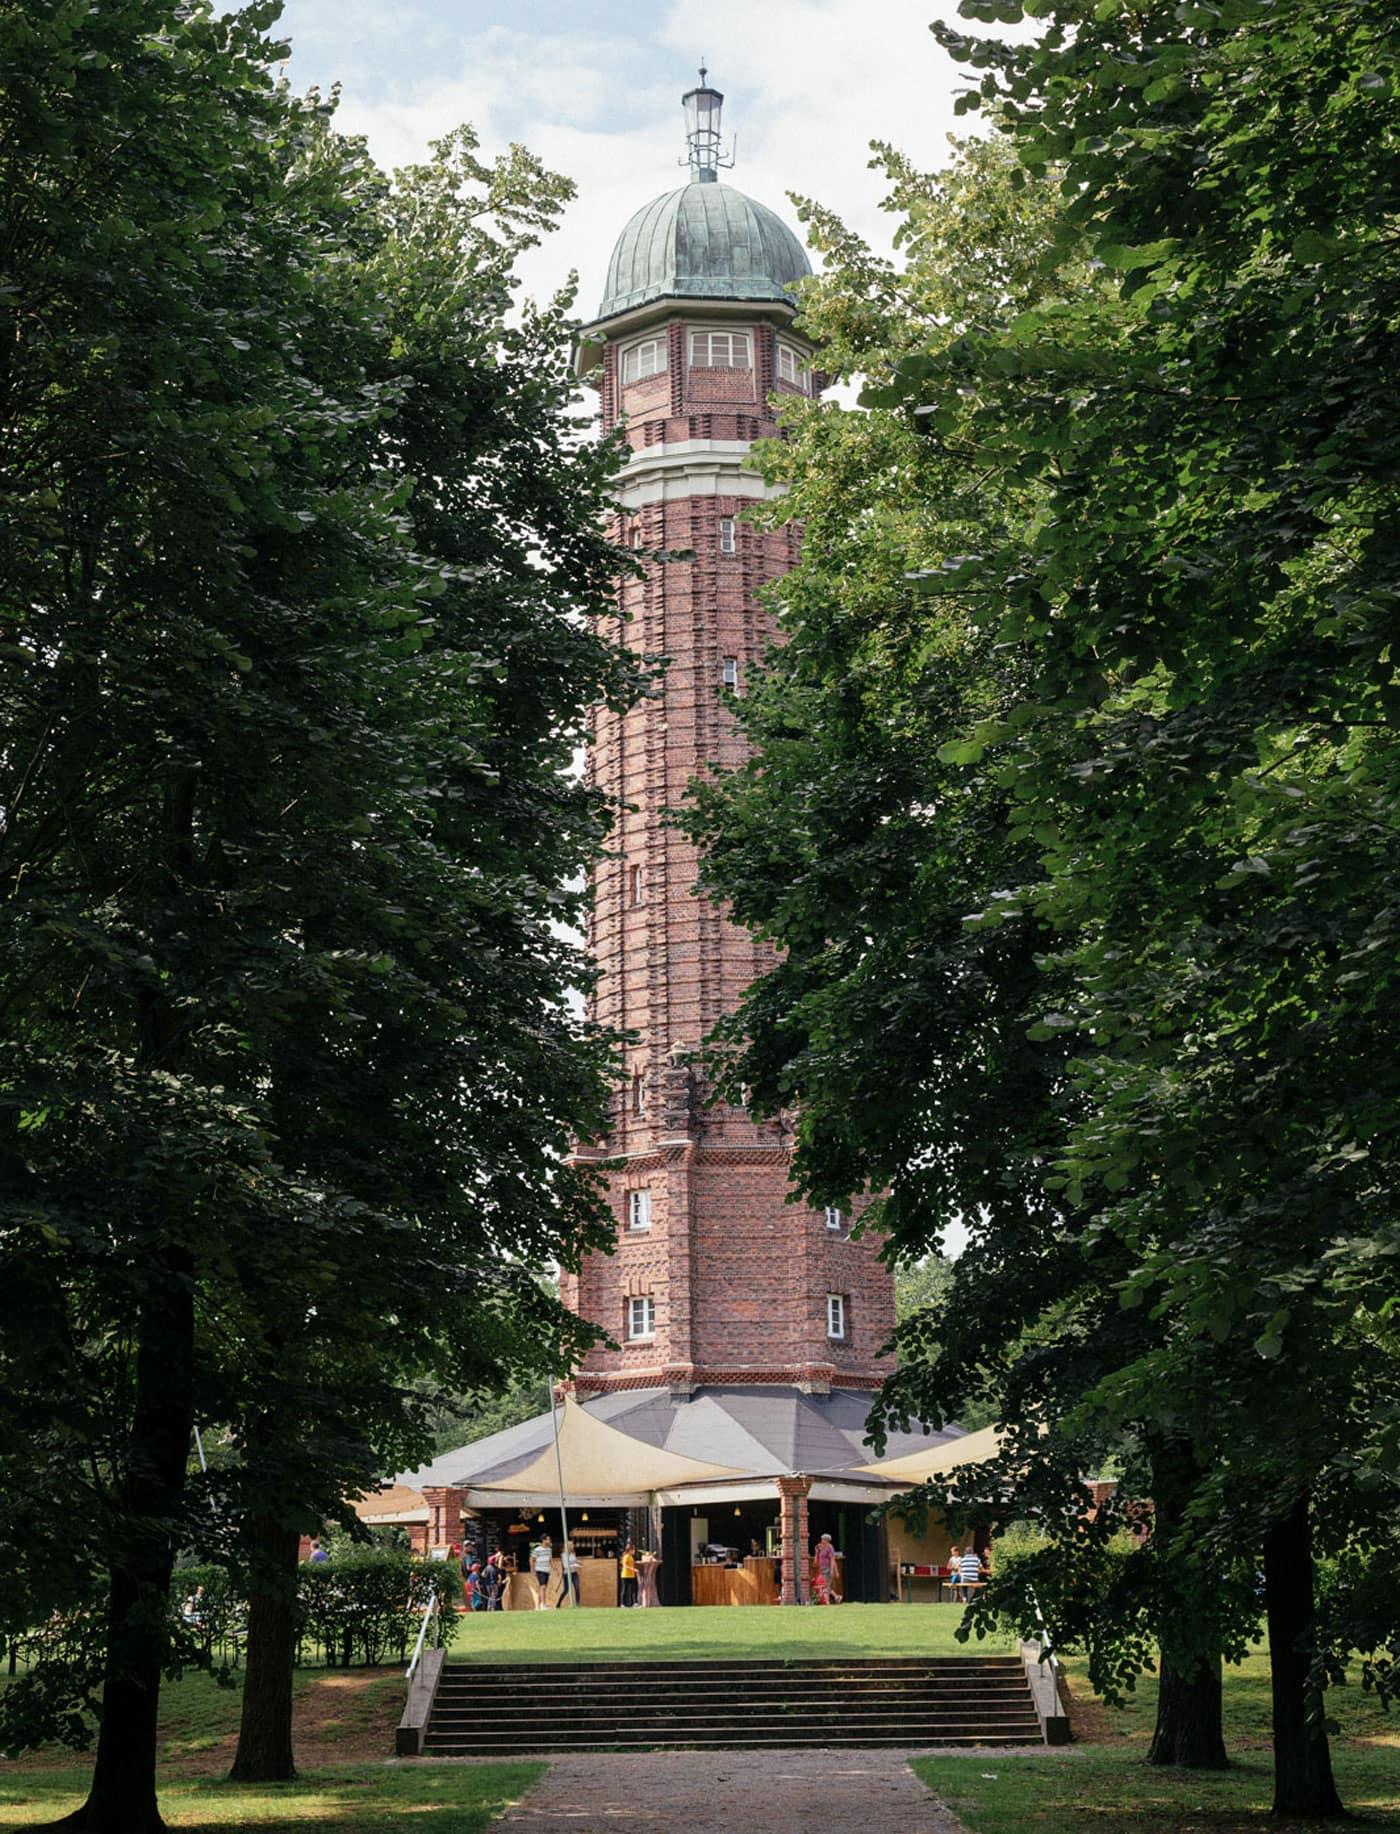 Ausflug mit Kindern in Berlin: Jungfernheide – Wasserturm // HIMBEER